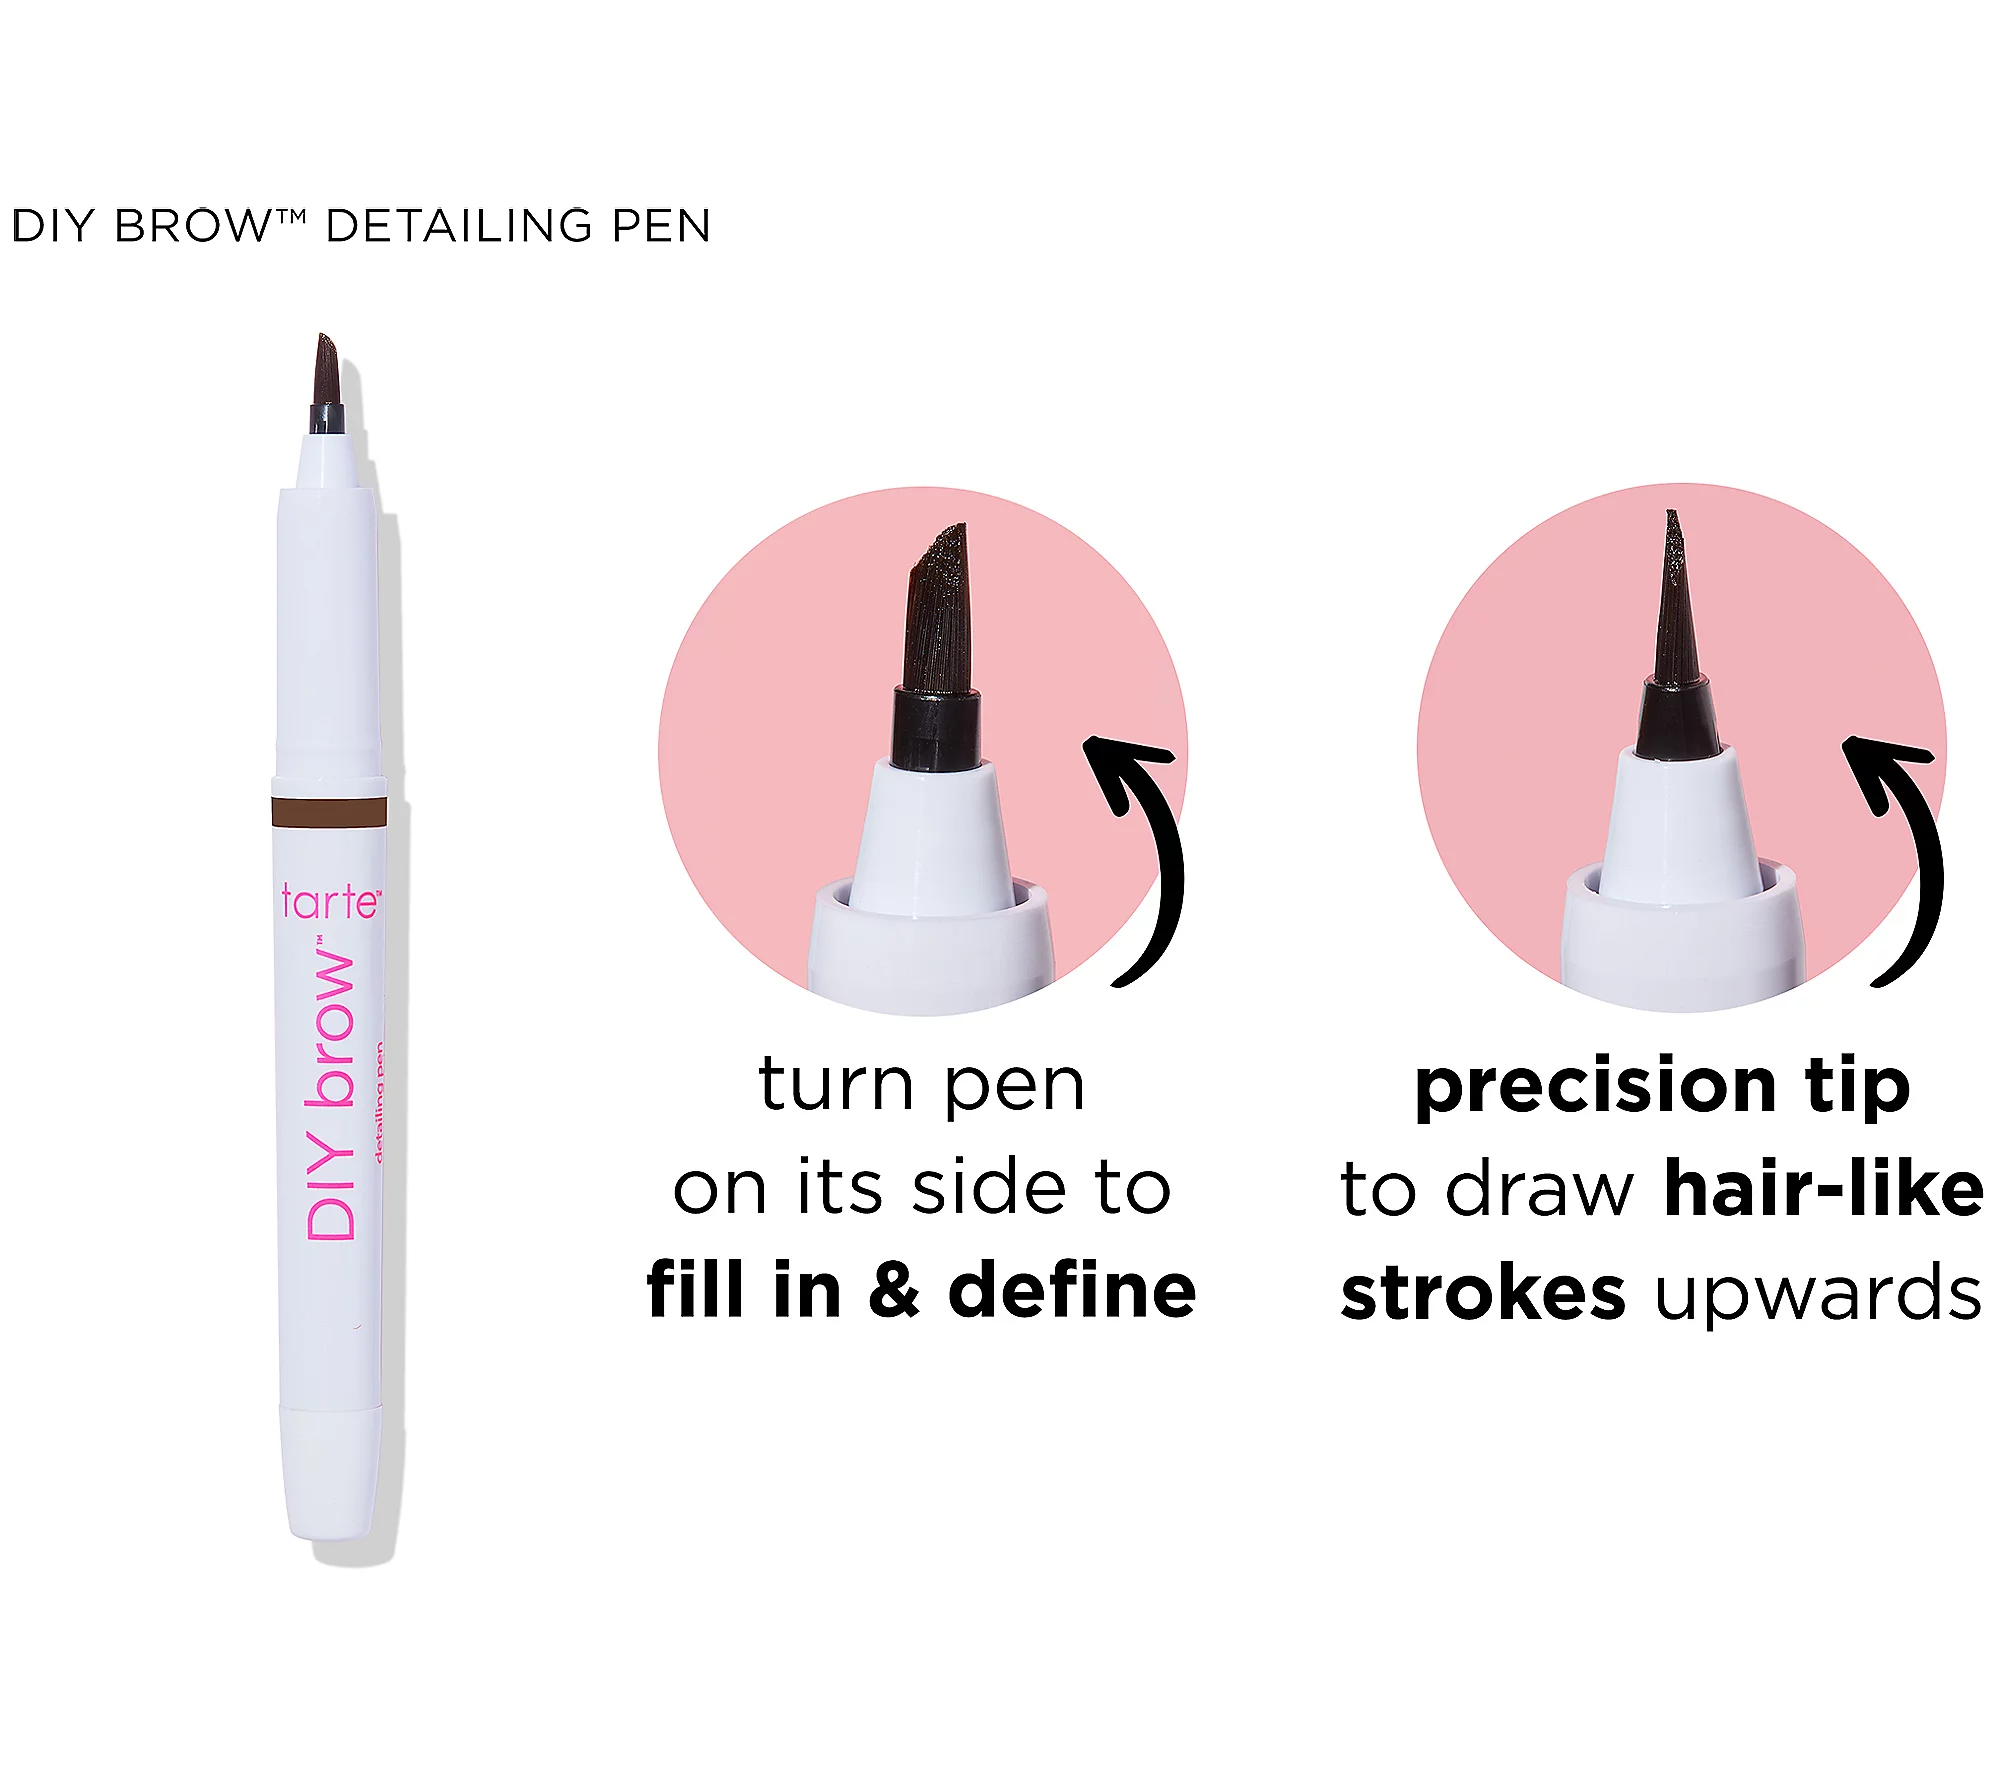 Tarte Big Eco DIY Brow Pen